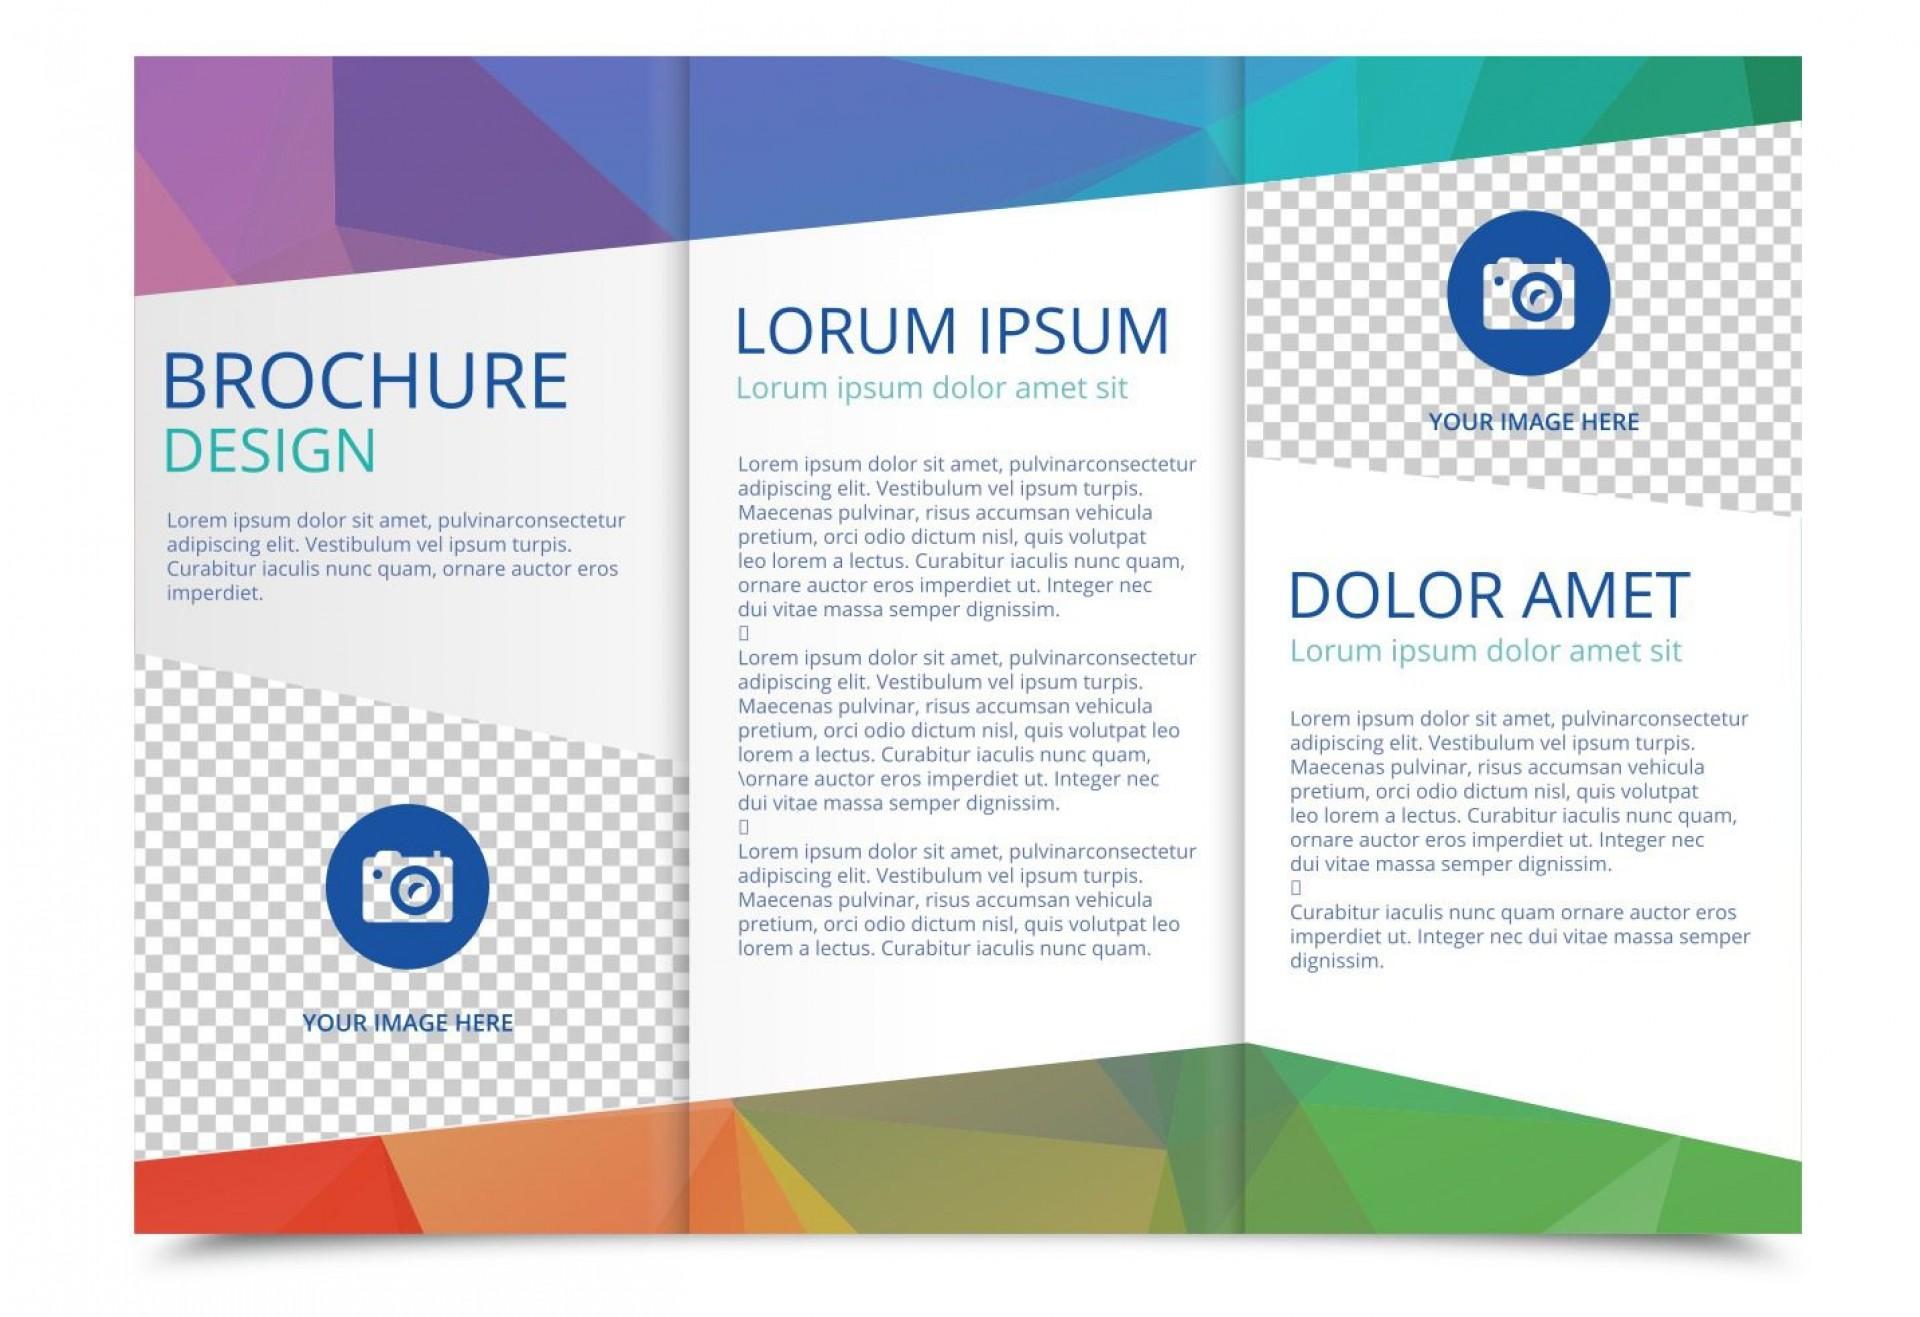 005 Impressive Free Tri Fold Brochure Template Sample  Microsoft Word 2010 Download Ai Downloadable For1920